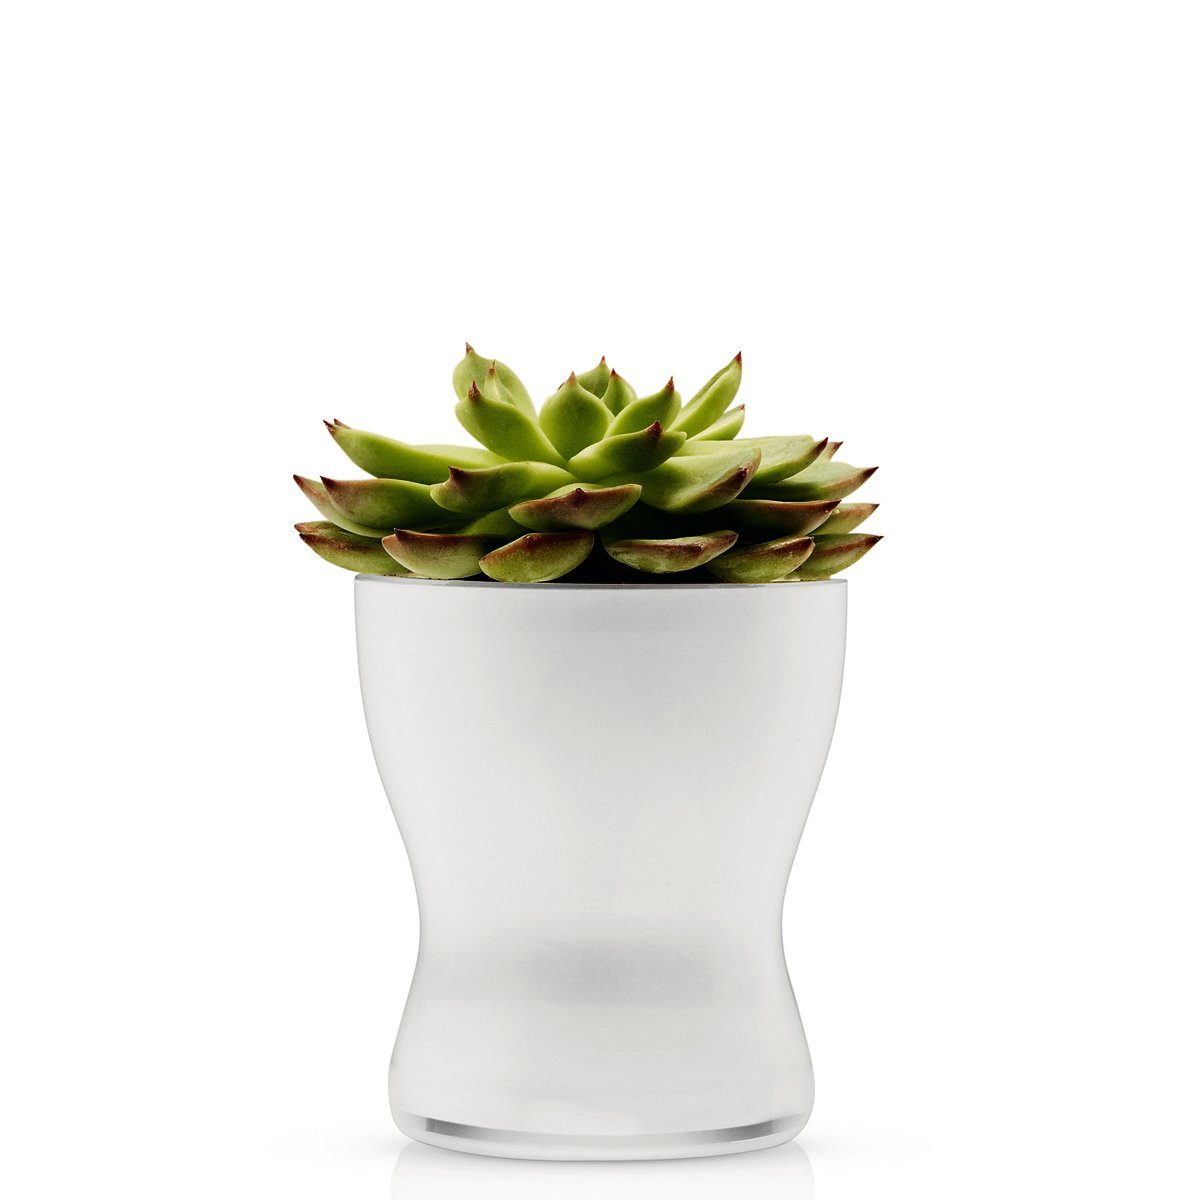 EVA SOLO Eva Solo Blumentopf aus Glas selbstbewässernd 11cm weiß